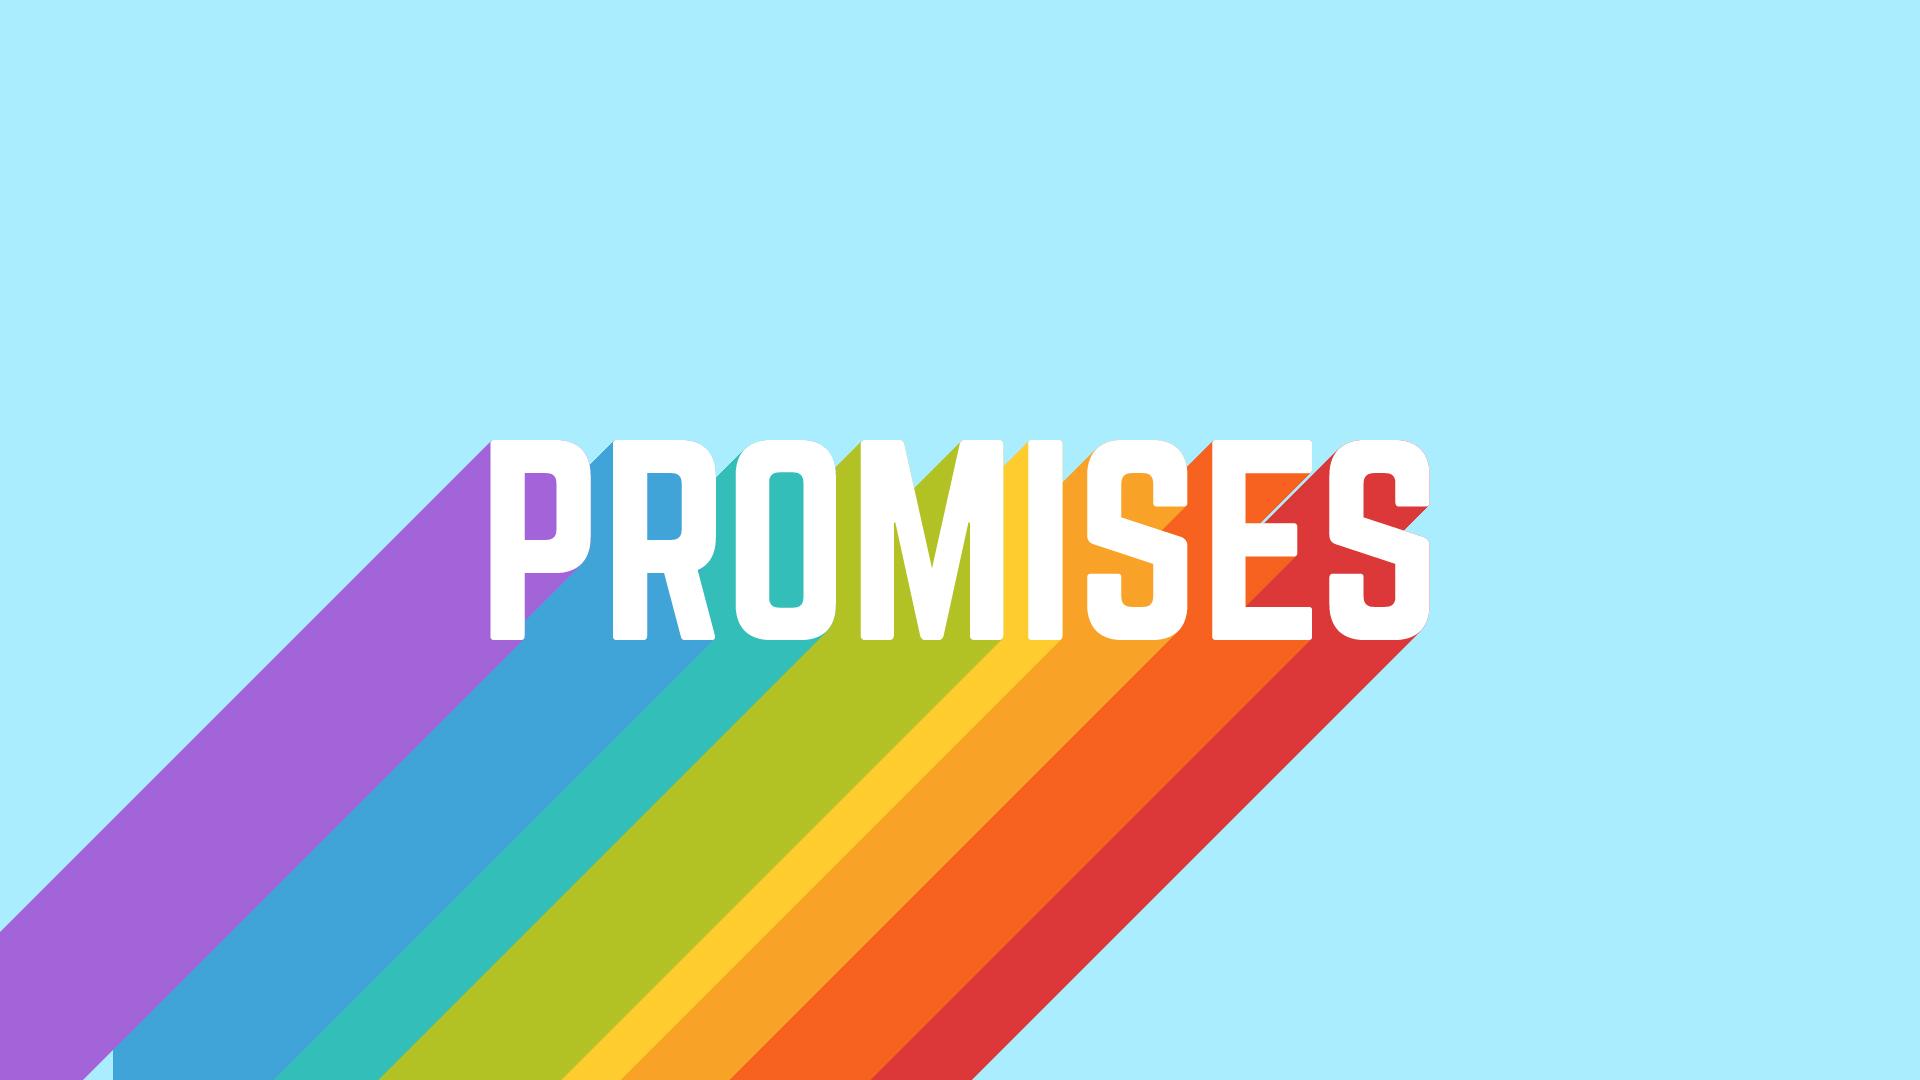 Promises Series 1920x1080.jpg